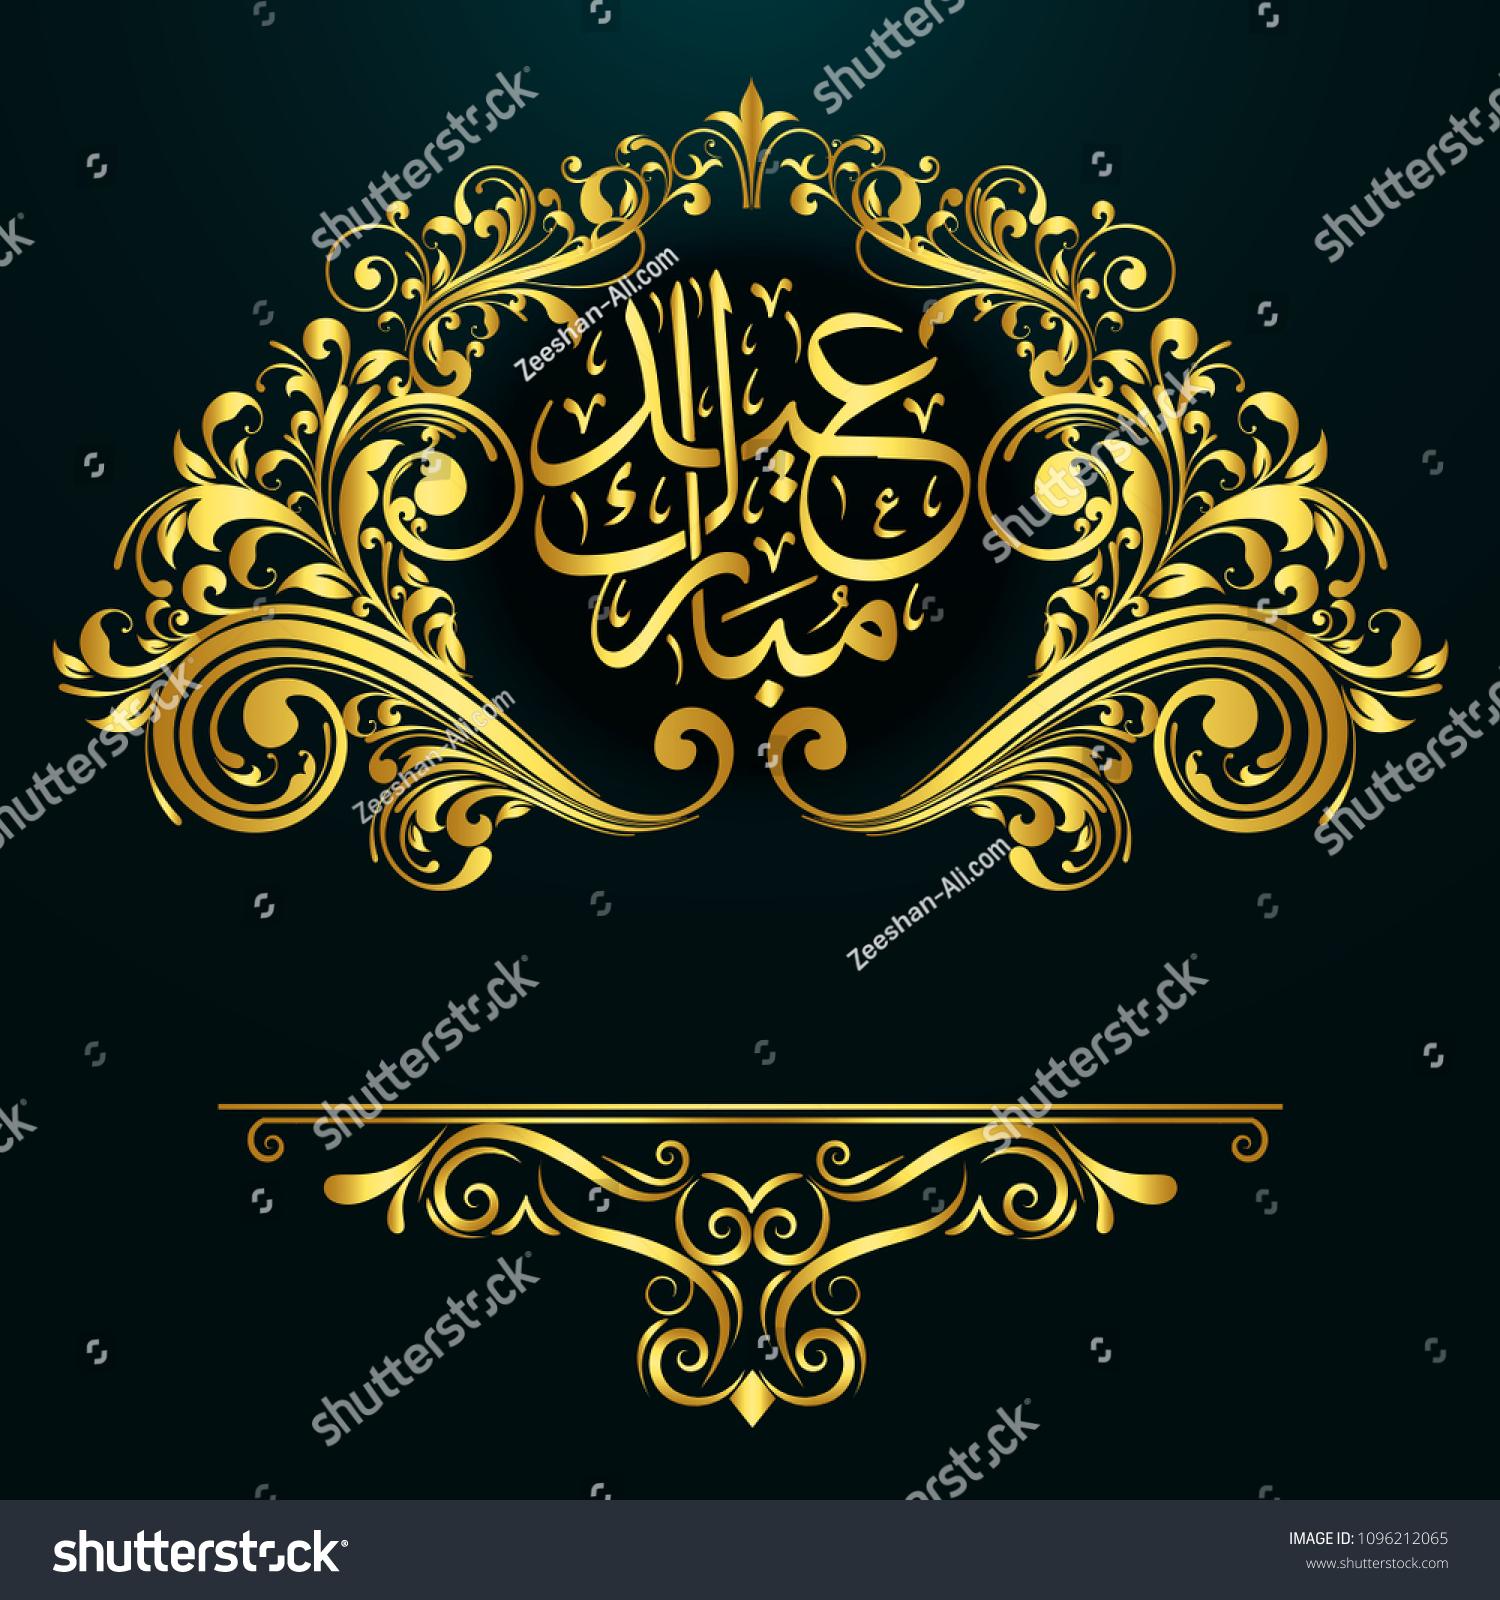 Islamic Design Stating Eid Mubarak Arabic Stock Vector Royalty Free